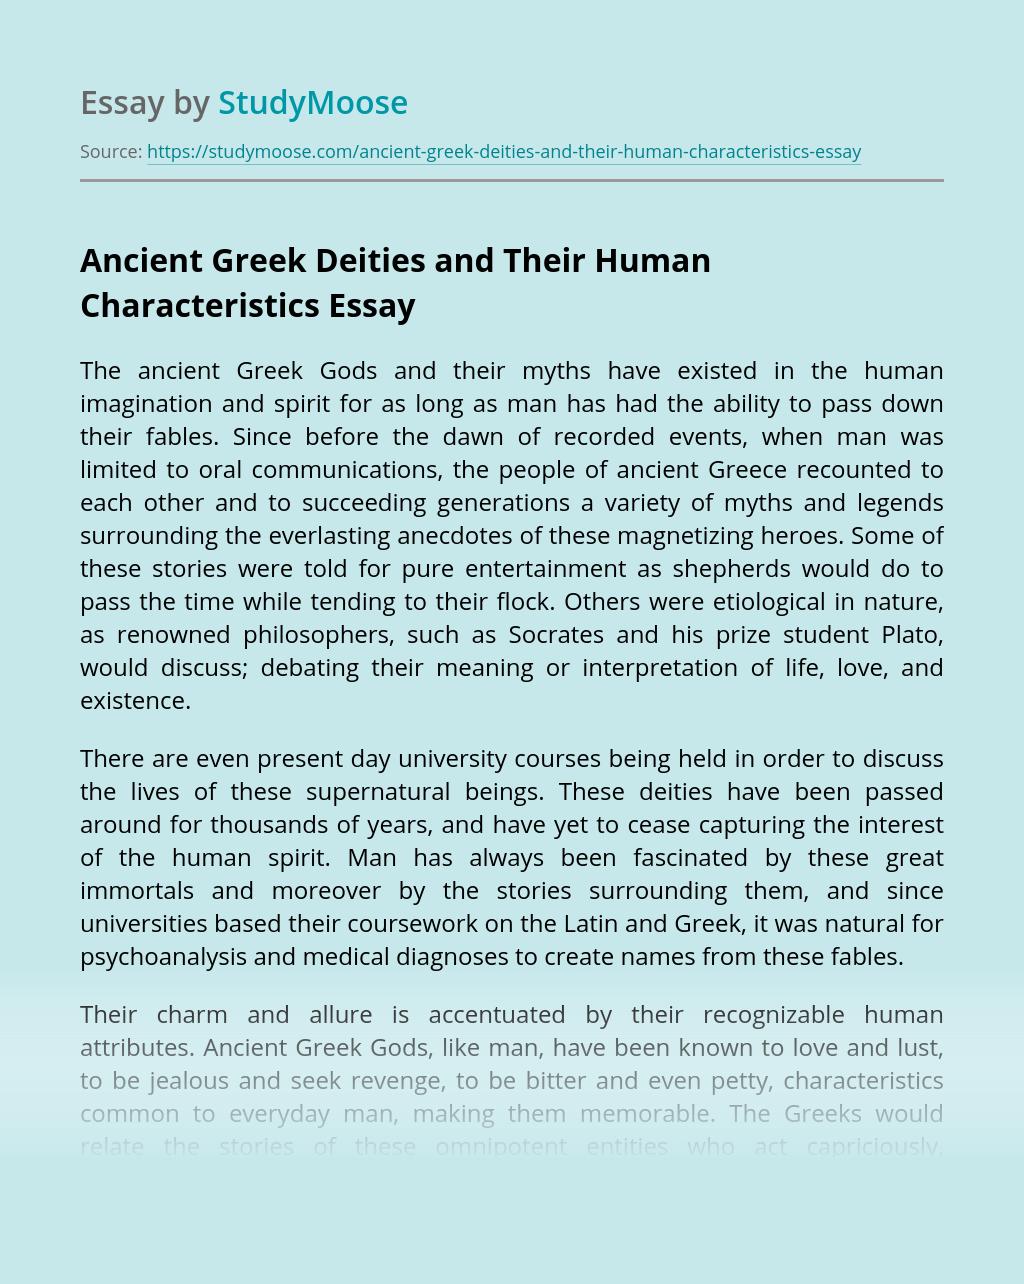 Ancient Greek Deities and Their Human Characteristics